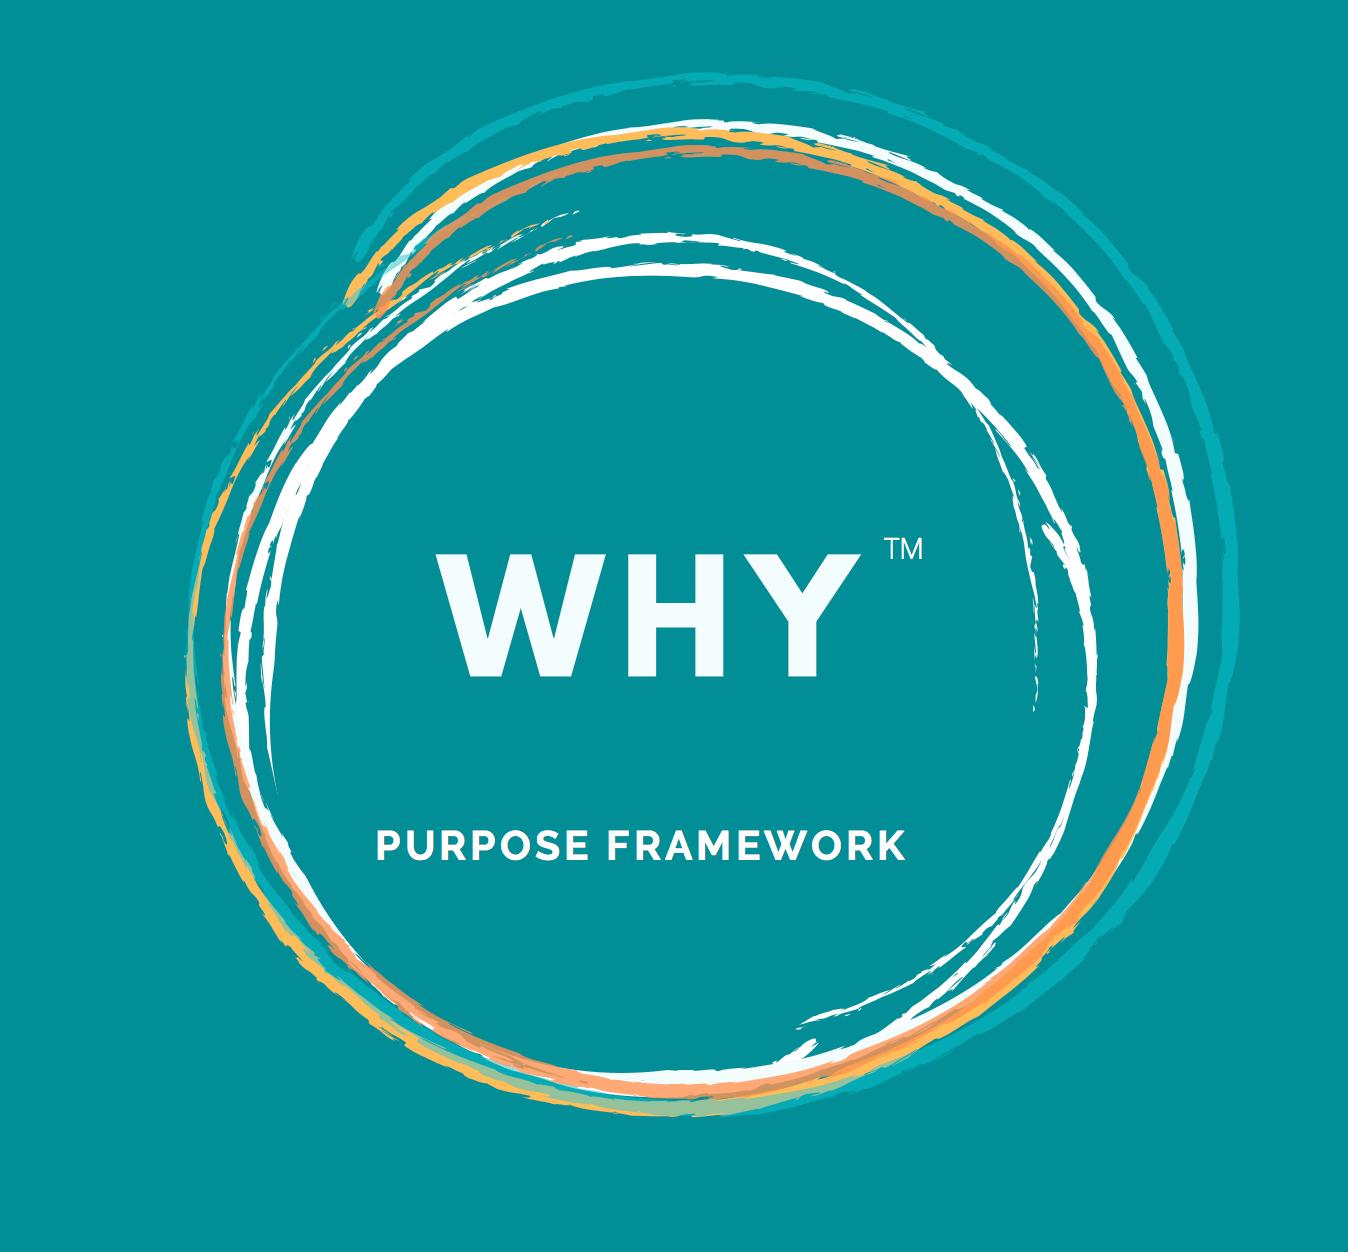 IG's WHY Purpose Framework